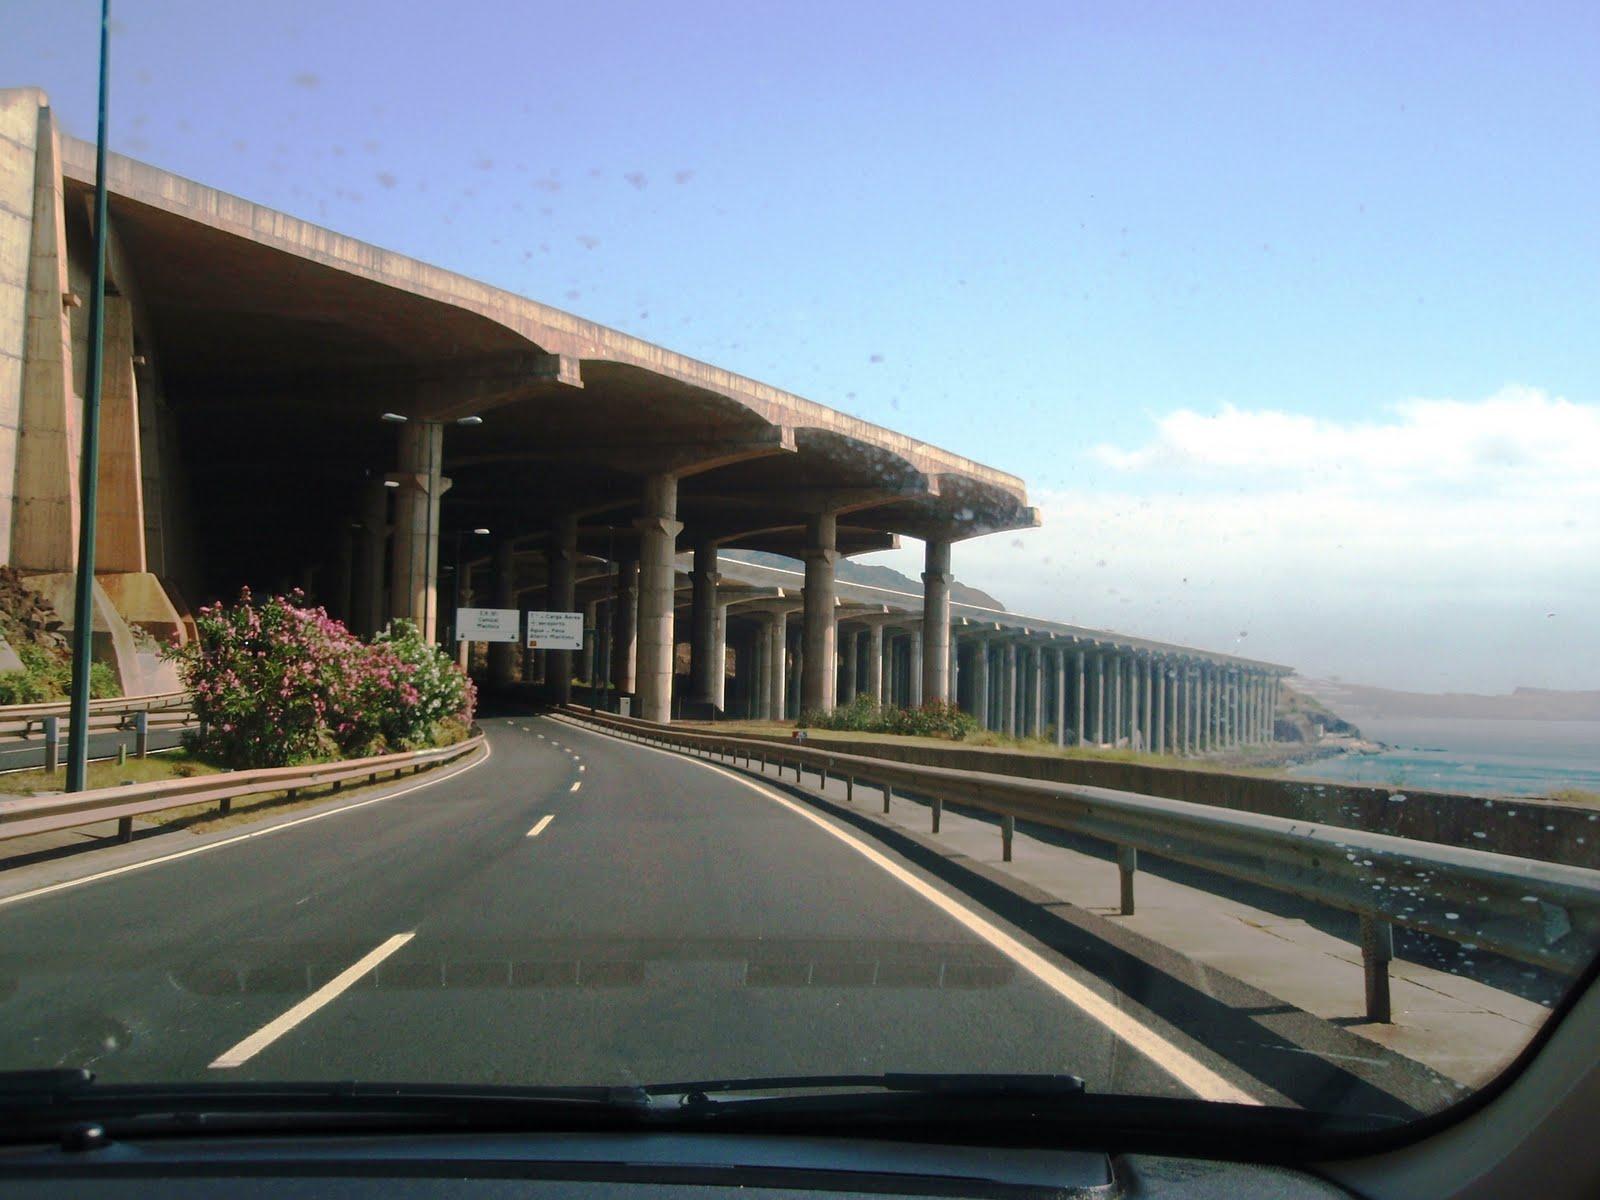 Aeroporto Madeira : Dreamteam ilha da madeira aeroporto